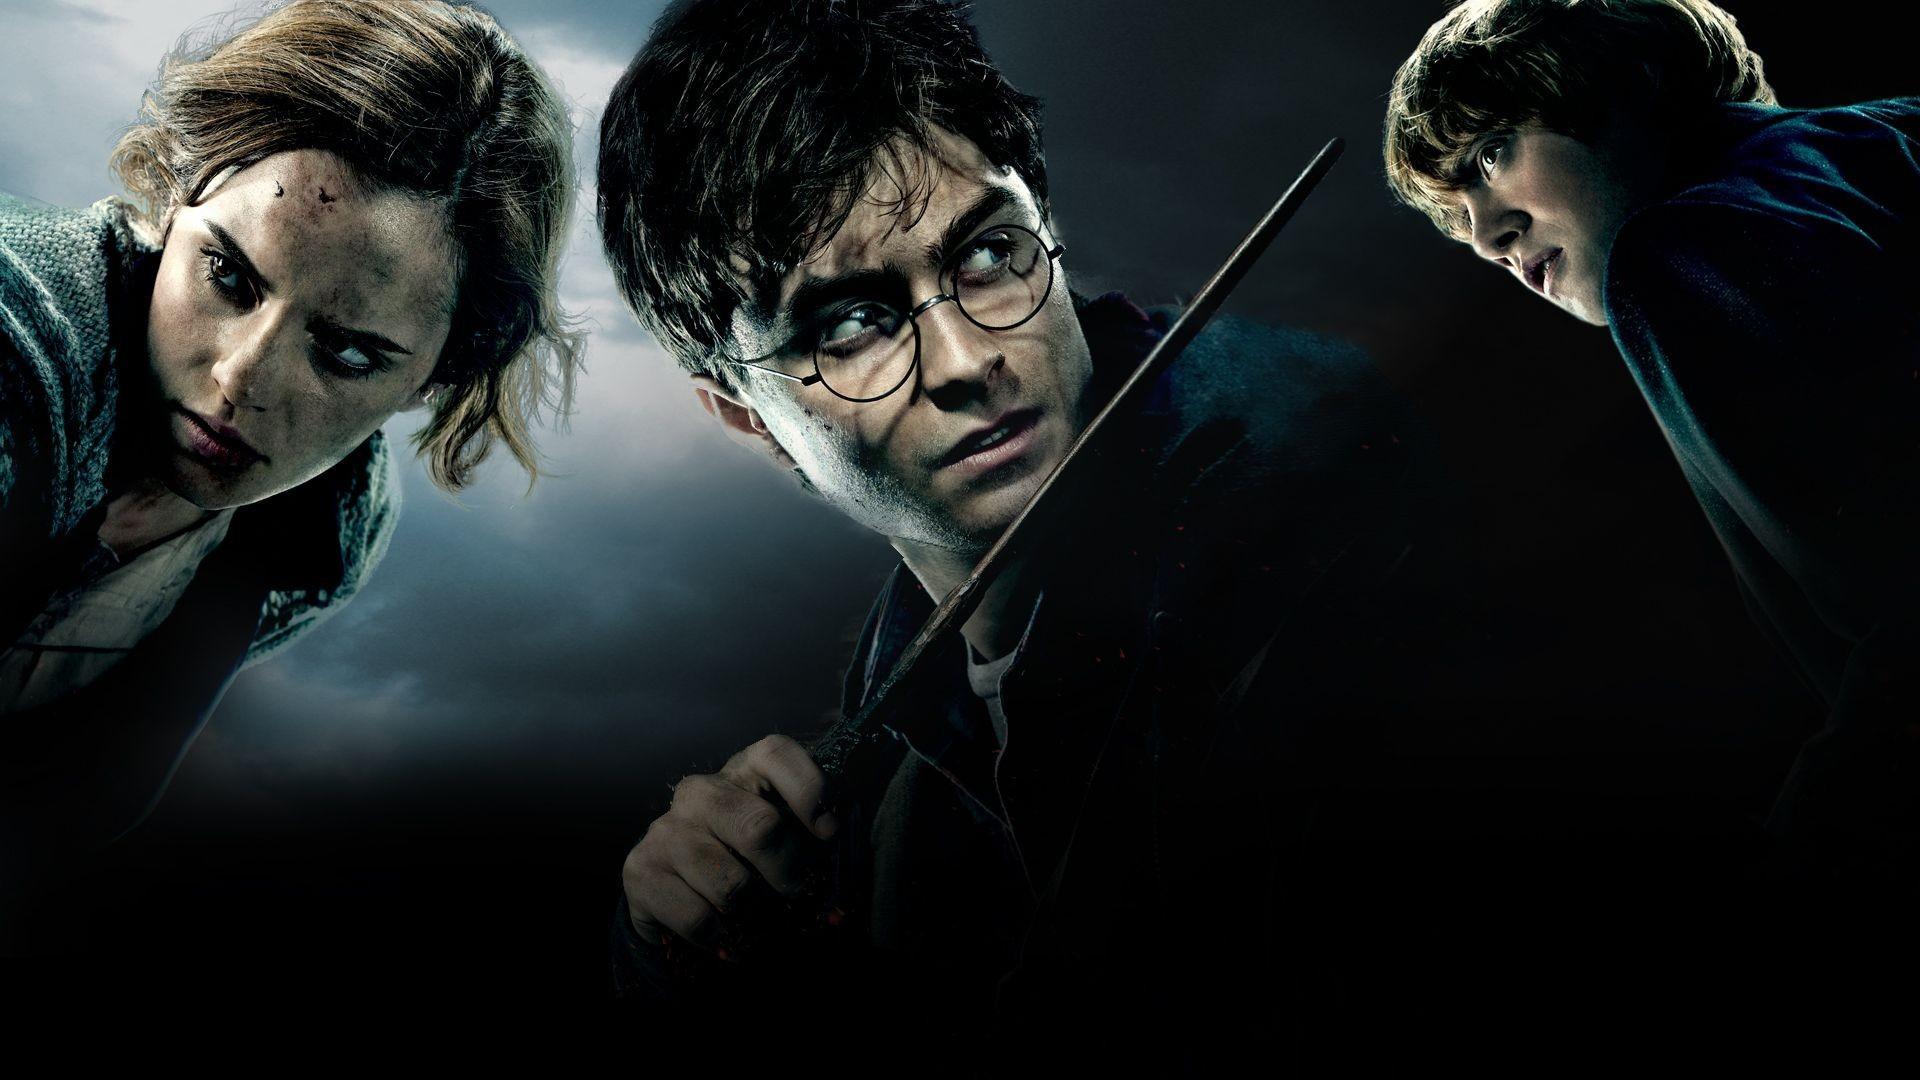 Harry Potter Deathly Hallows G Wallpaper 1920x1080 101991